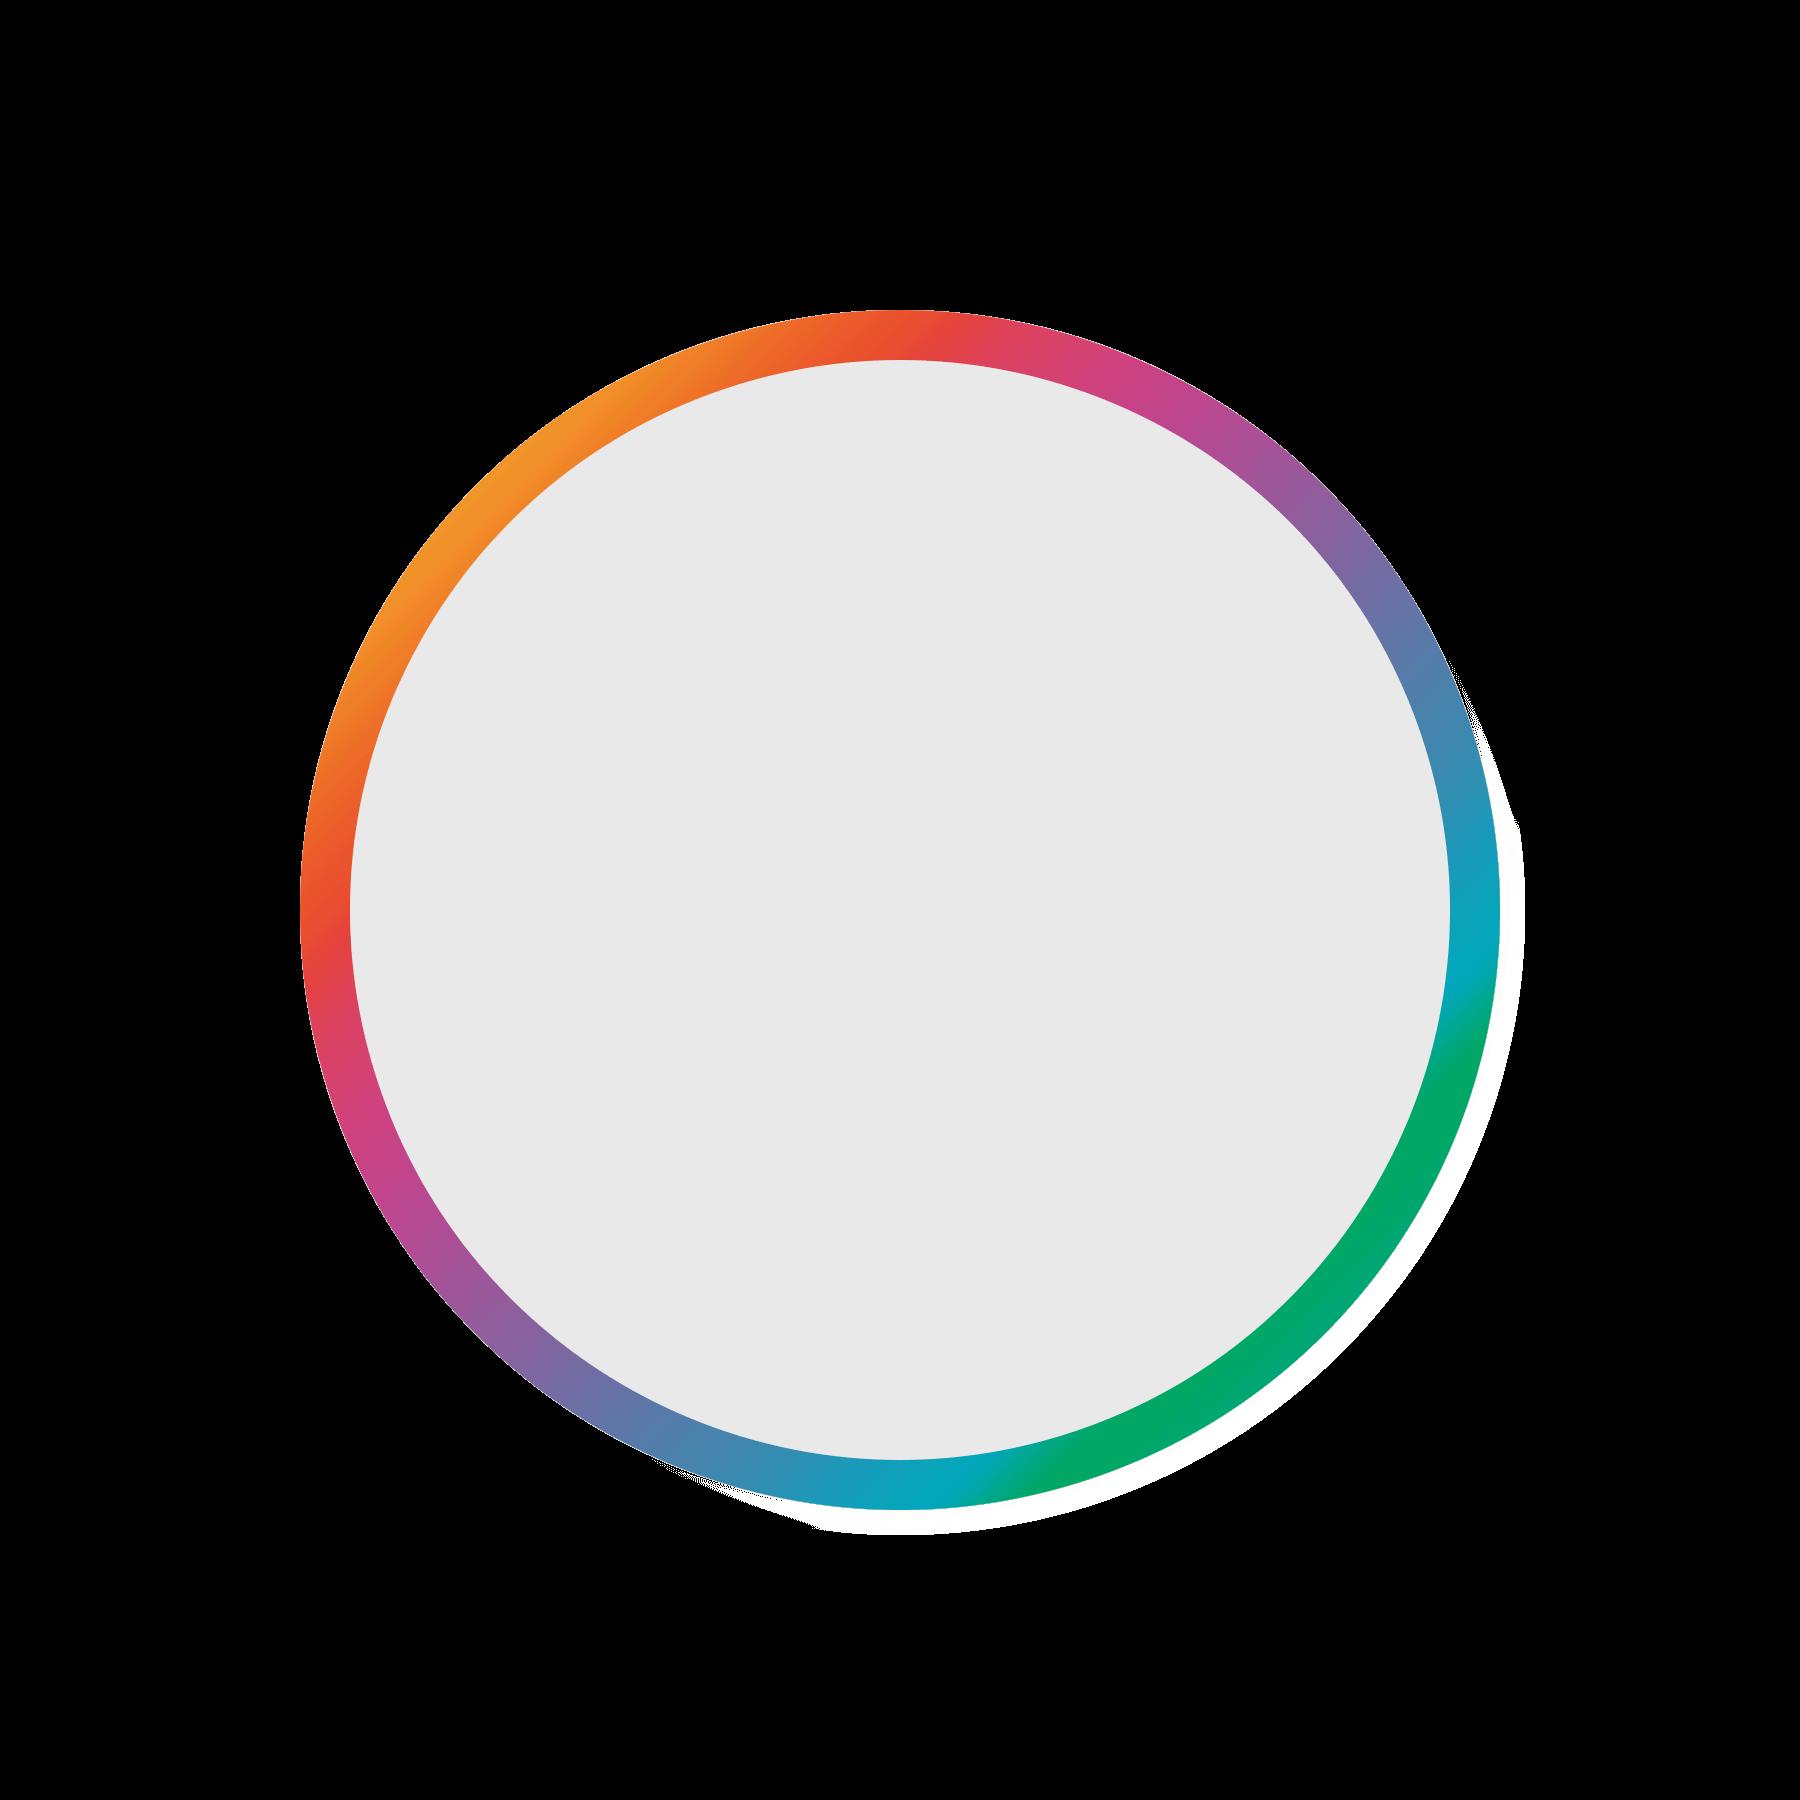 XMG TRINITY mATX - AMD Ryzen  | Desktop-PC | front left